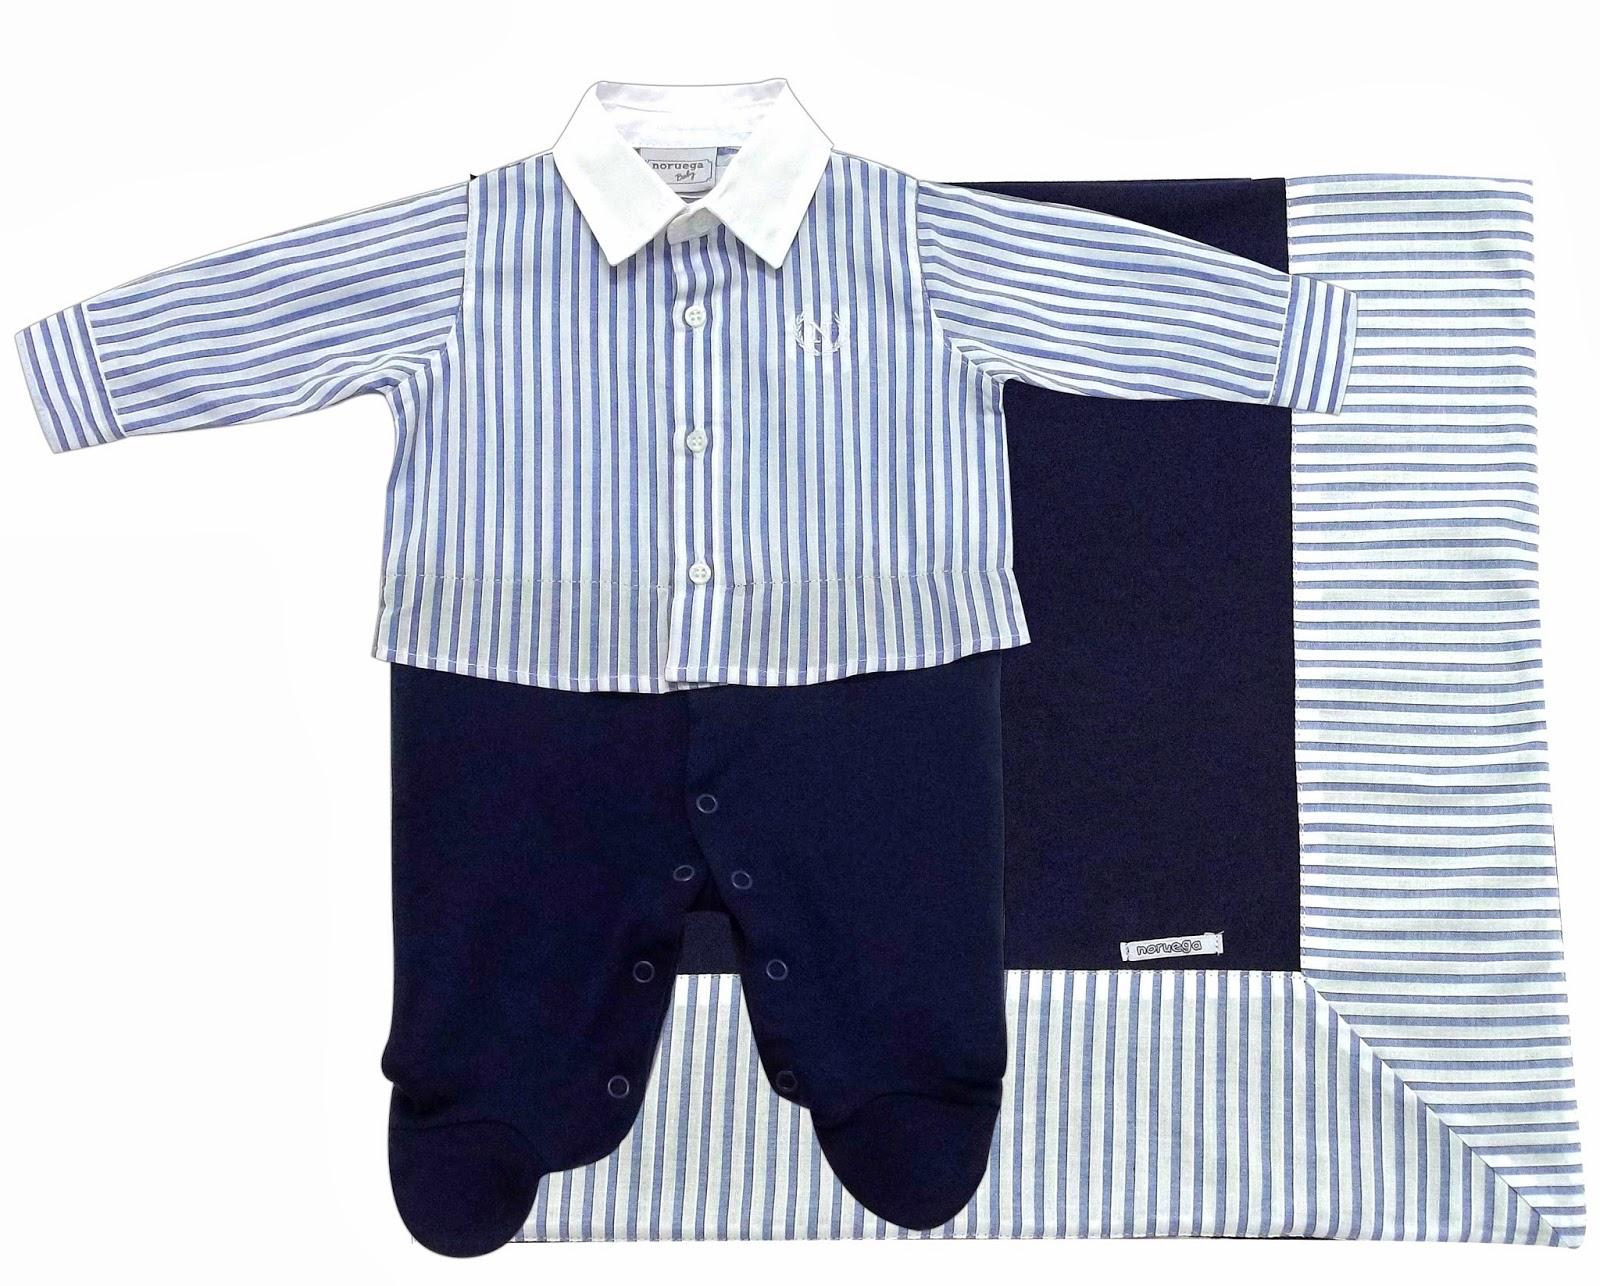 Roupas de bebê da marca Noruega para meninos. Saída de maternidade de qualidade.